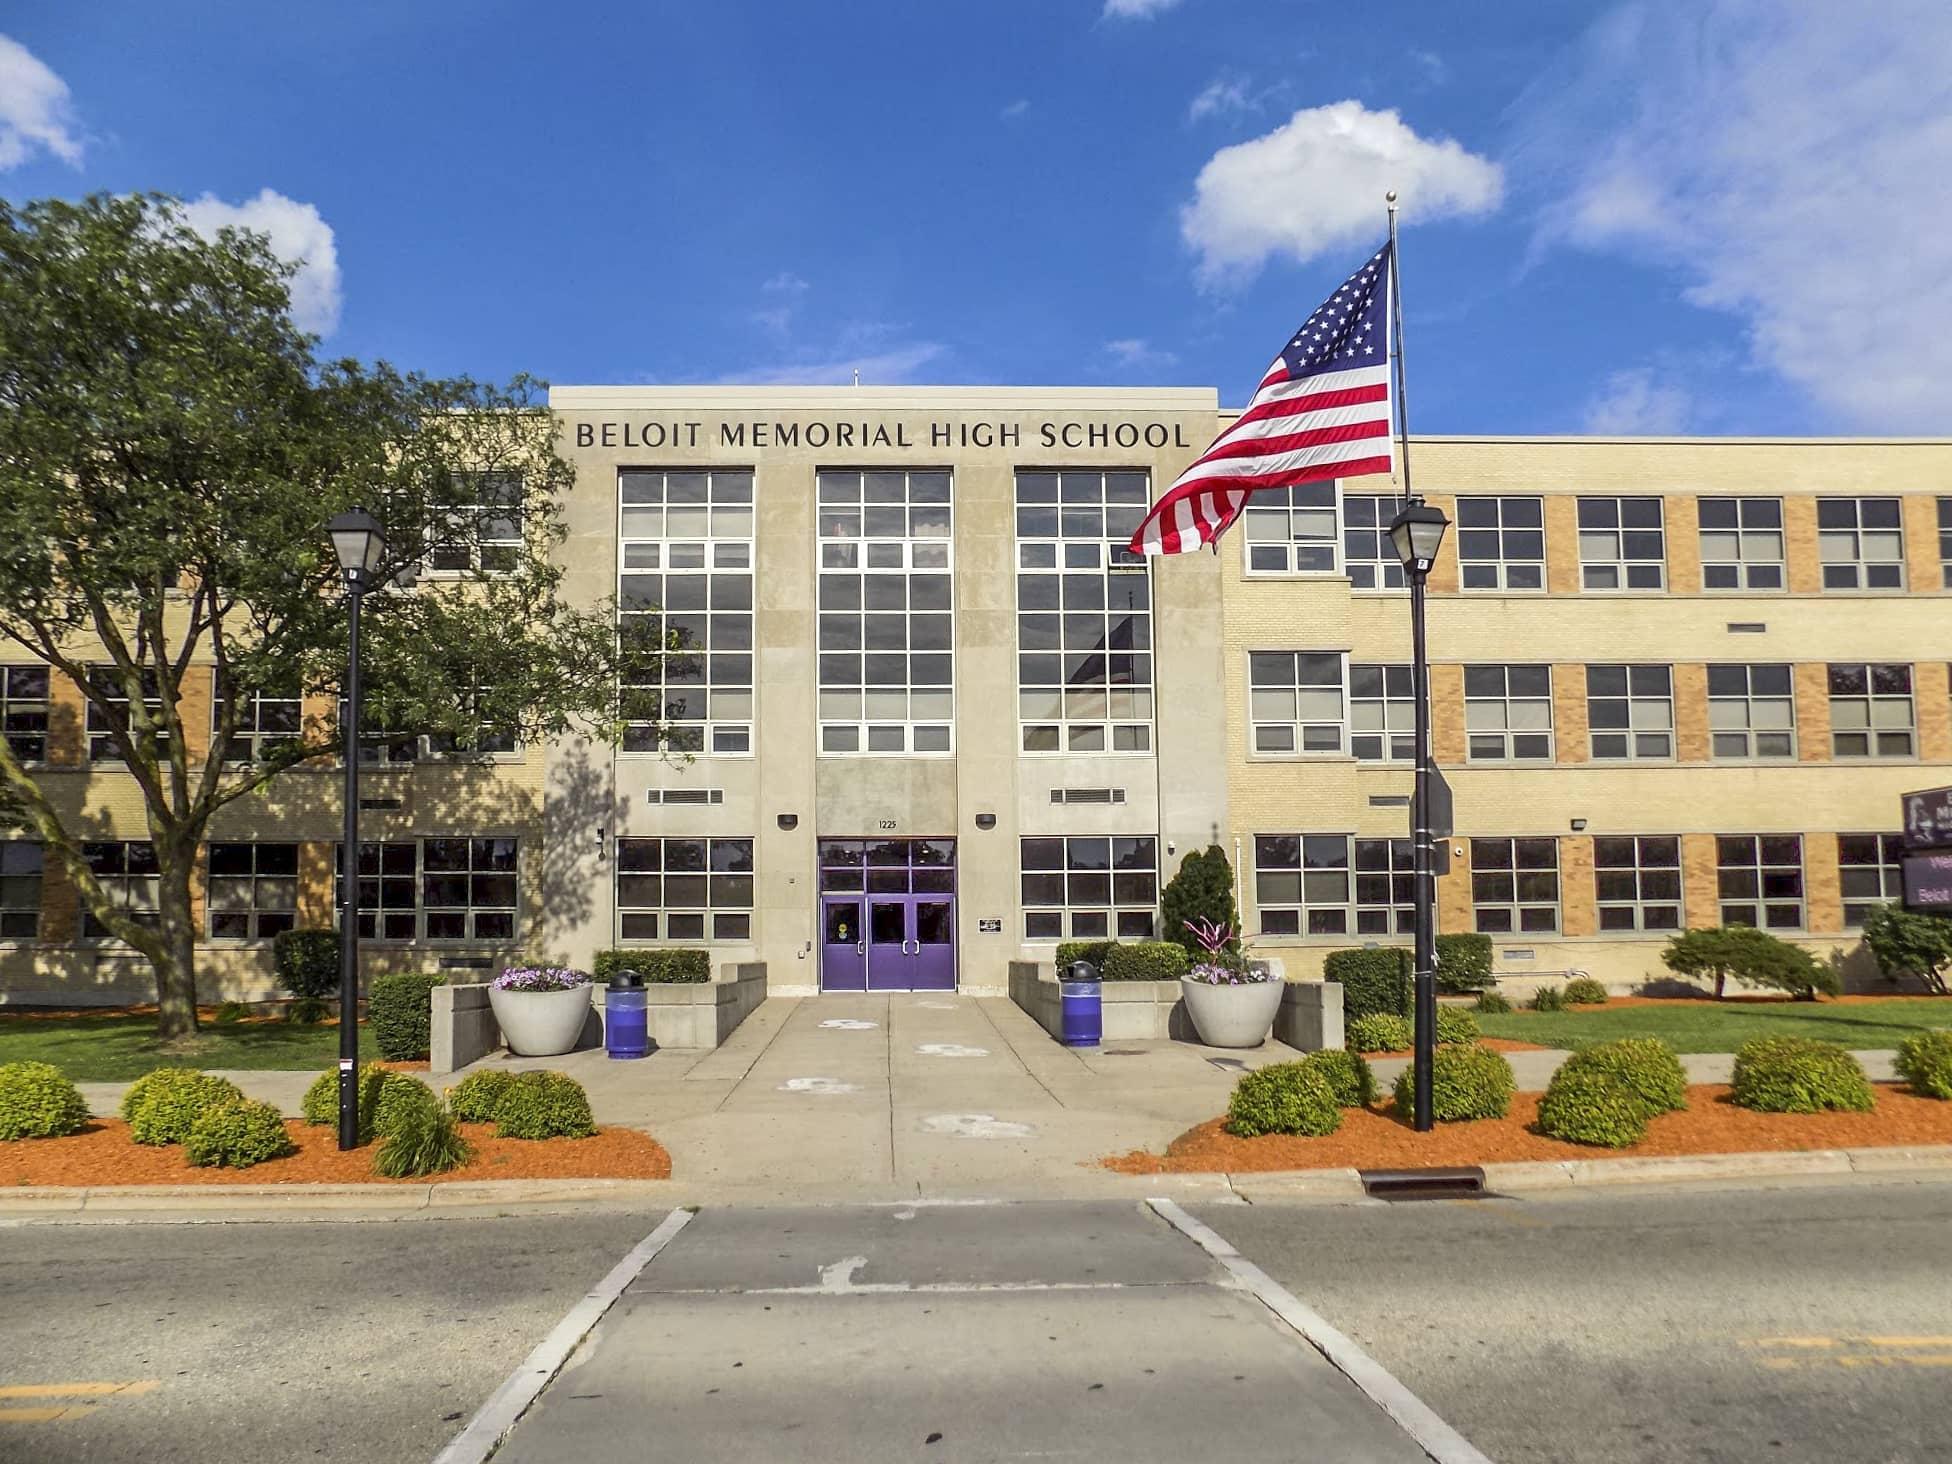 Bomb threat prompts evacuation of SLO High School